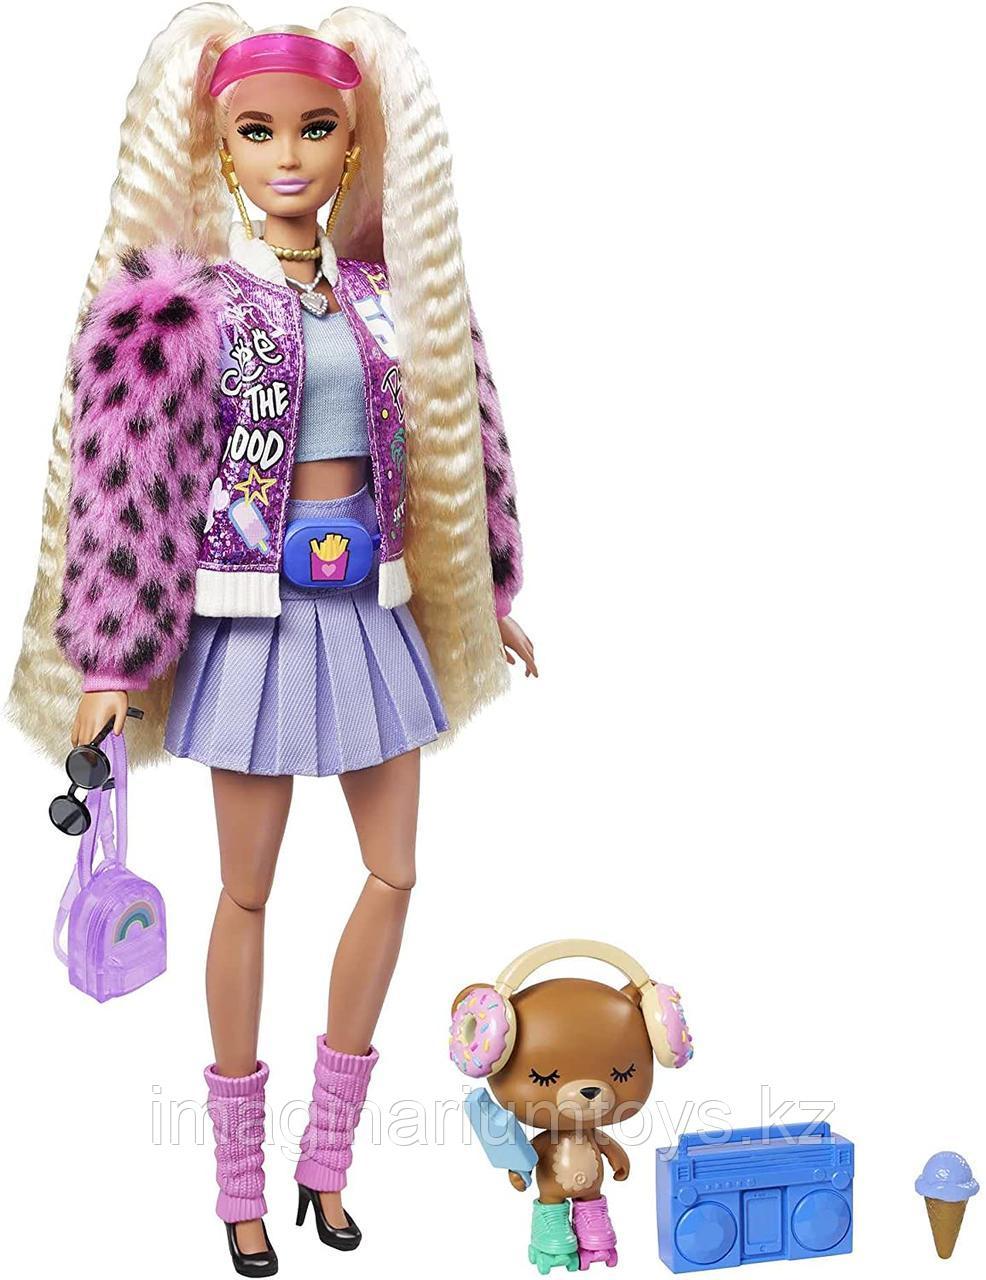 Кукла Барби Экстра №8 Блондинка с хвостиками Barbie Extra